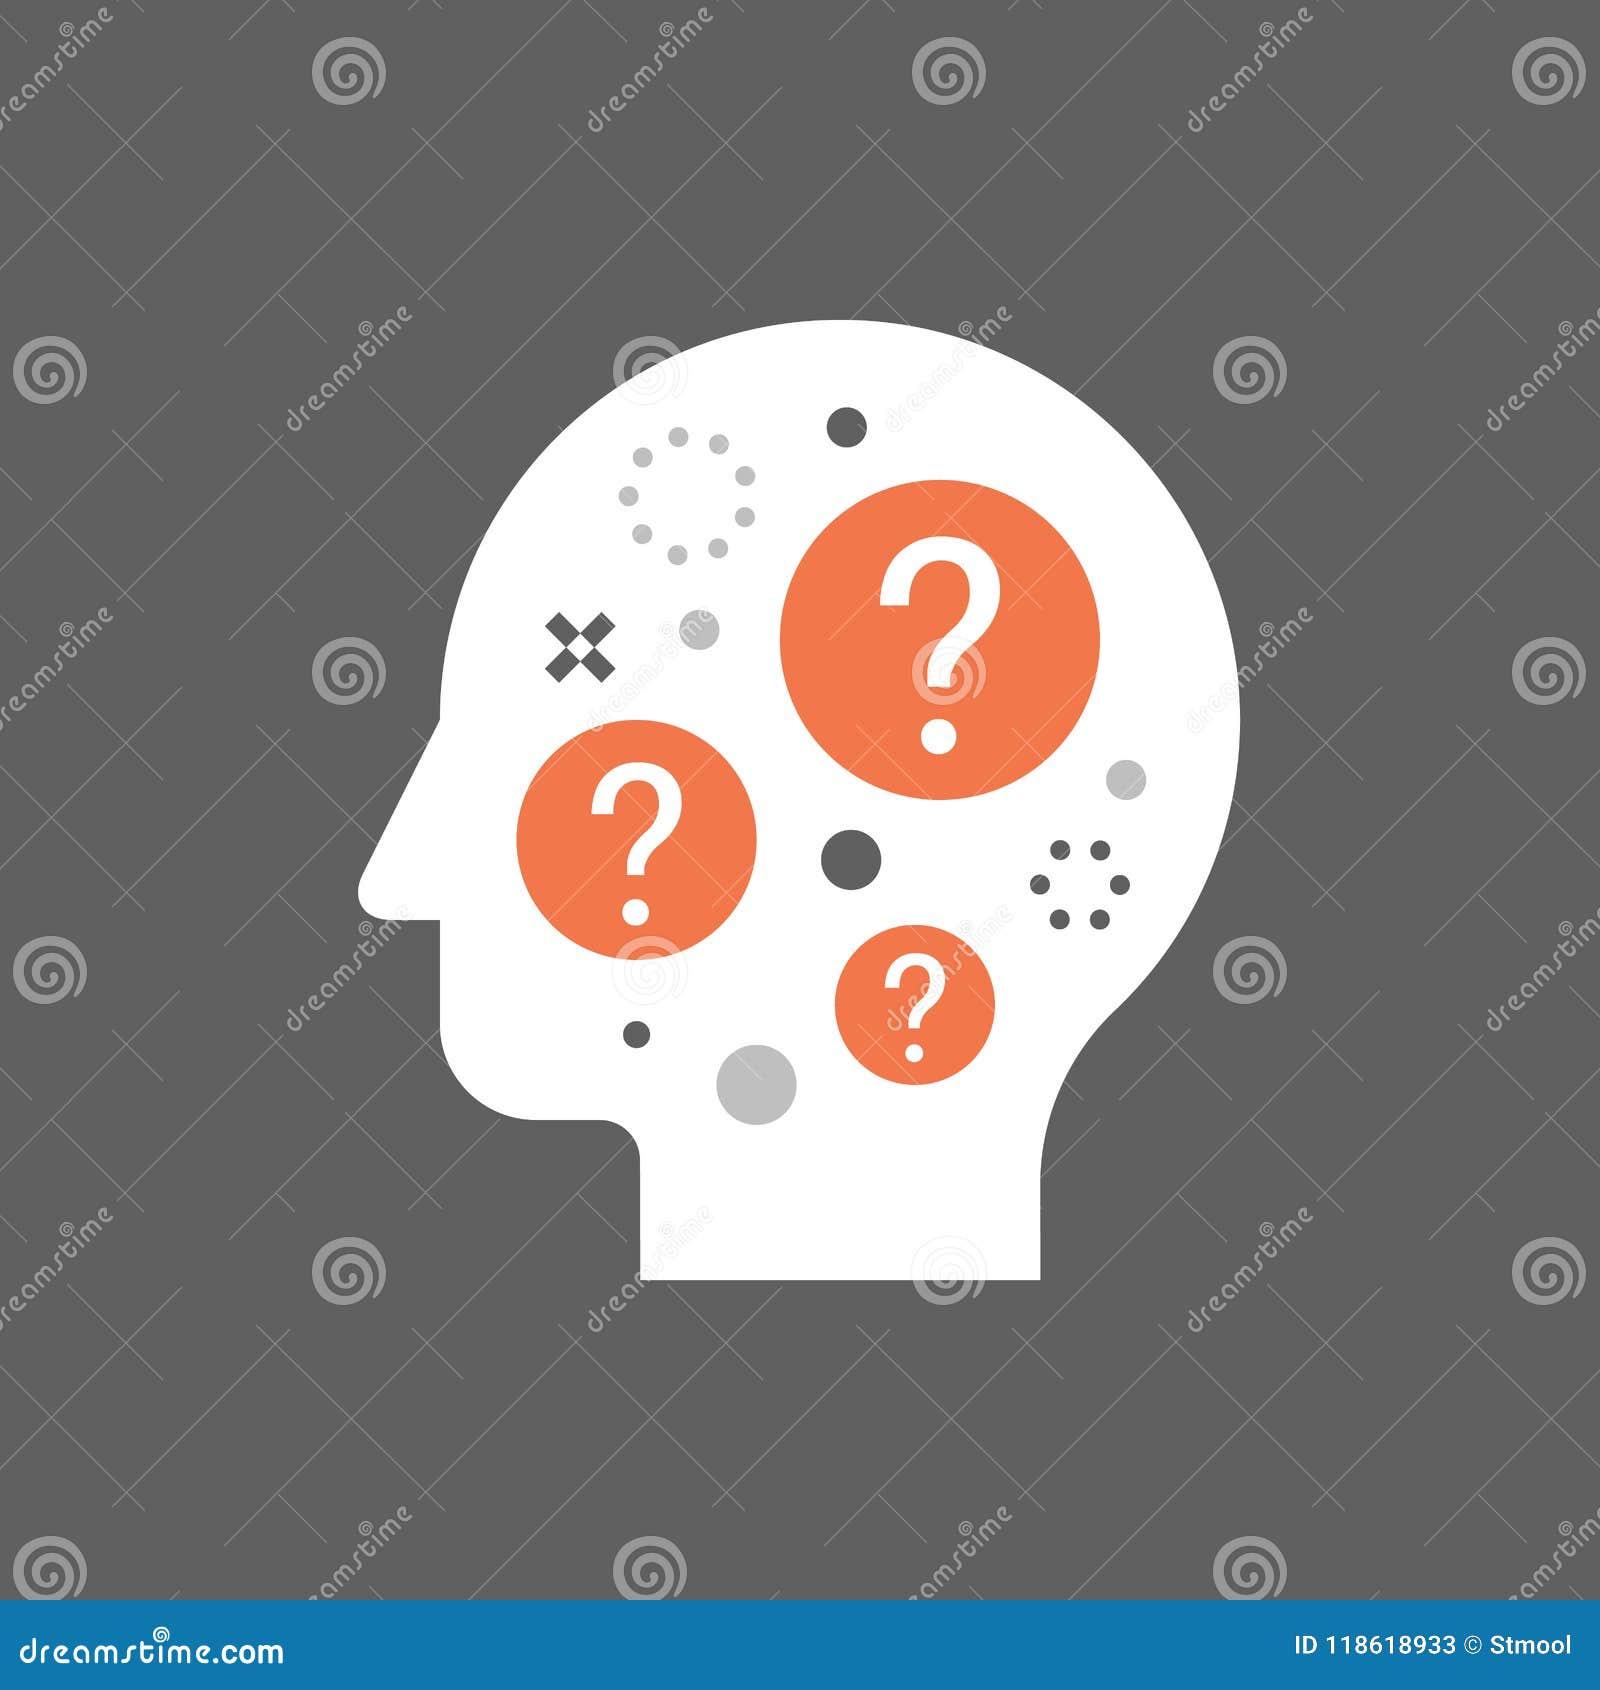 Brainstorm Concept Decision Making Difficult Choice Moral Dilemma